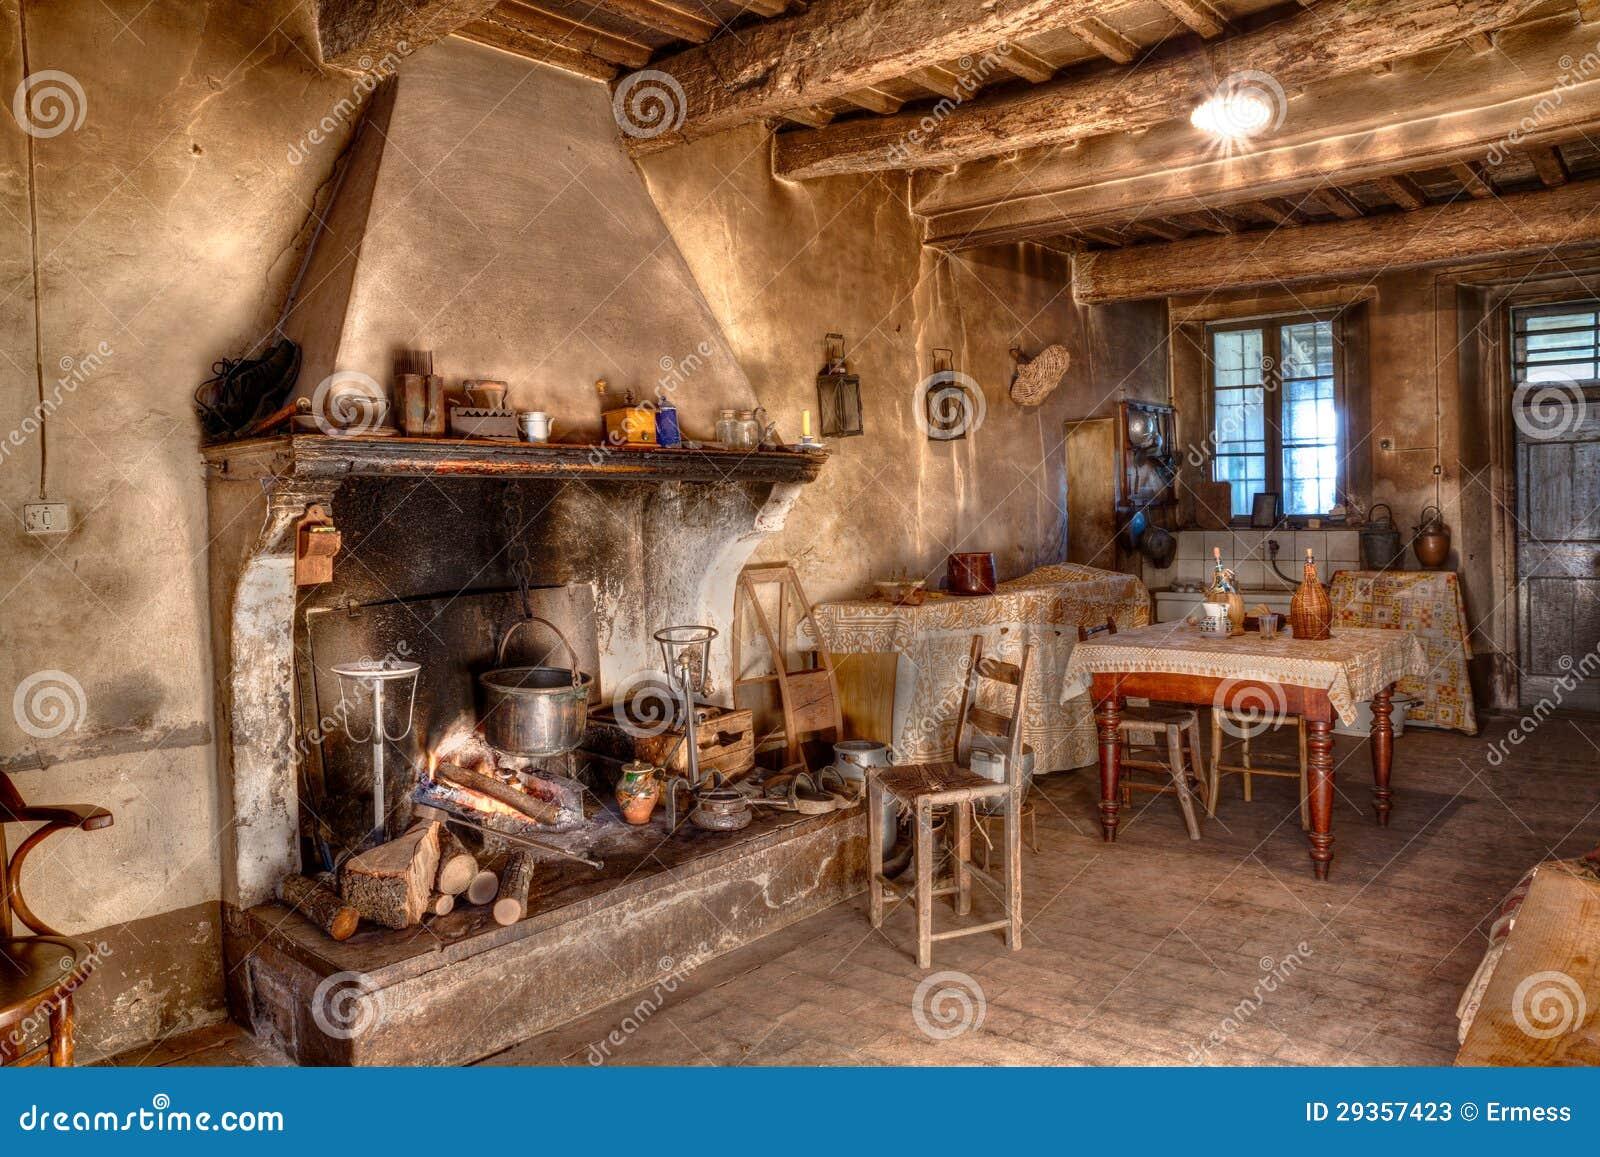 Old Times Farmhouse Stock Photos Image 29357423